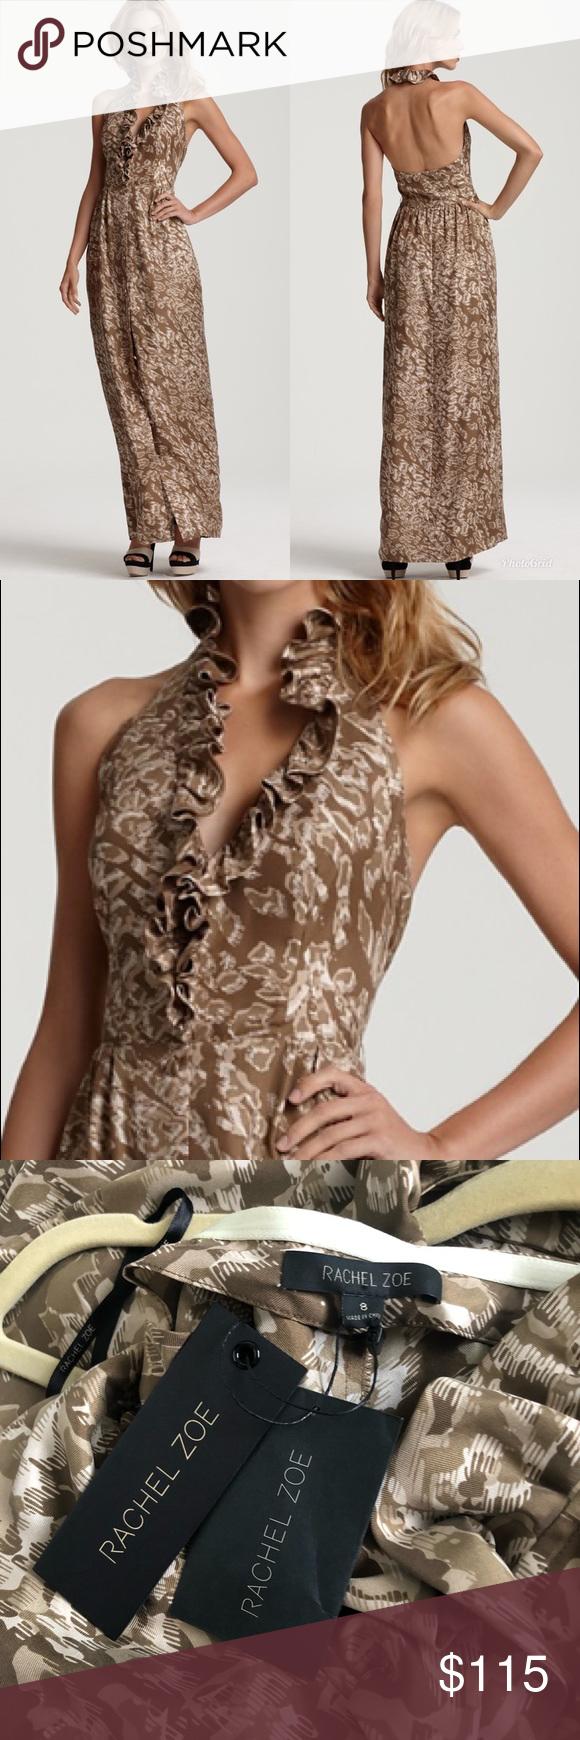 Nwt Rachel Zoe Jacqueline Halter Maxi Dress Size 8 New With Tags Beige Printed Silk Maxi Dress By Rachel Halter Maxi Dresses Rachel Zoe Dresses Silk Maxi Dress [ 1740 x 580 Pixel ]